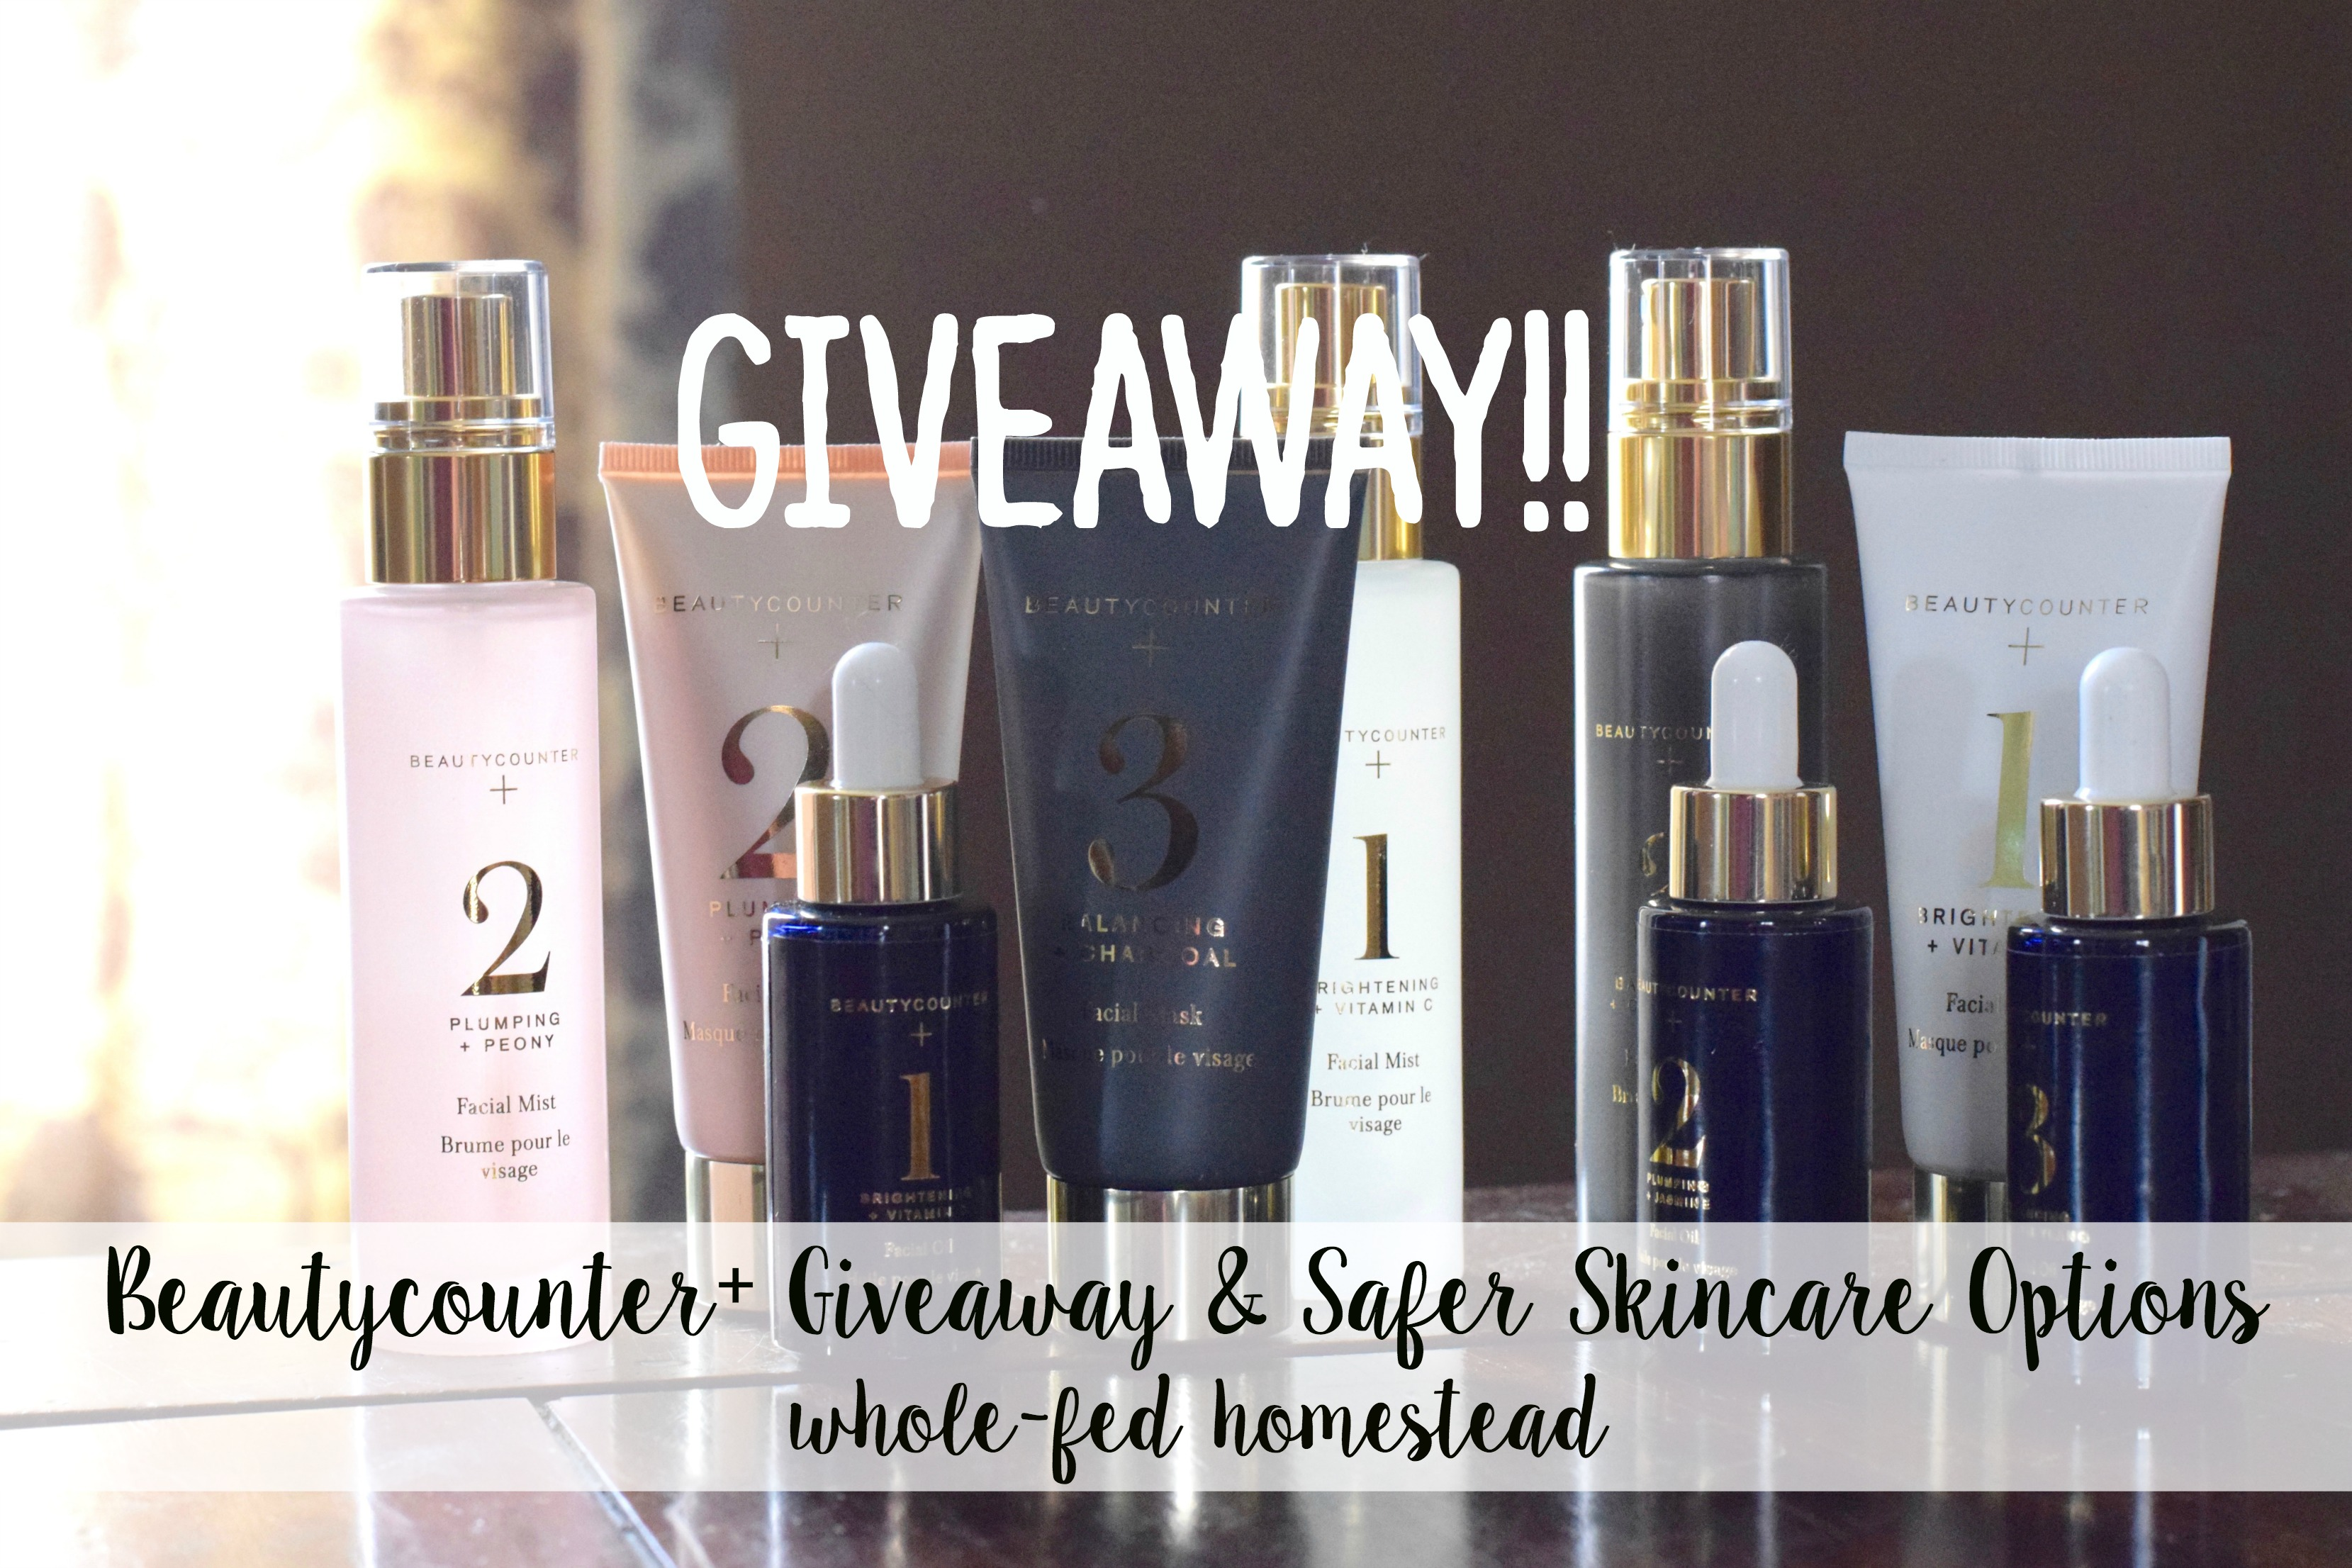 Beautycounter+ Giveaway | Whole-Fed Homestead